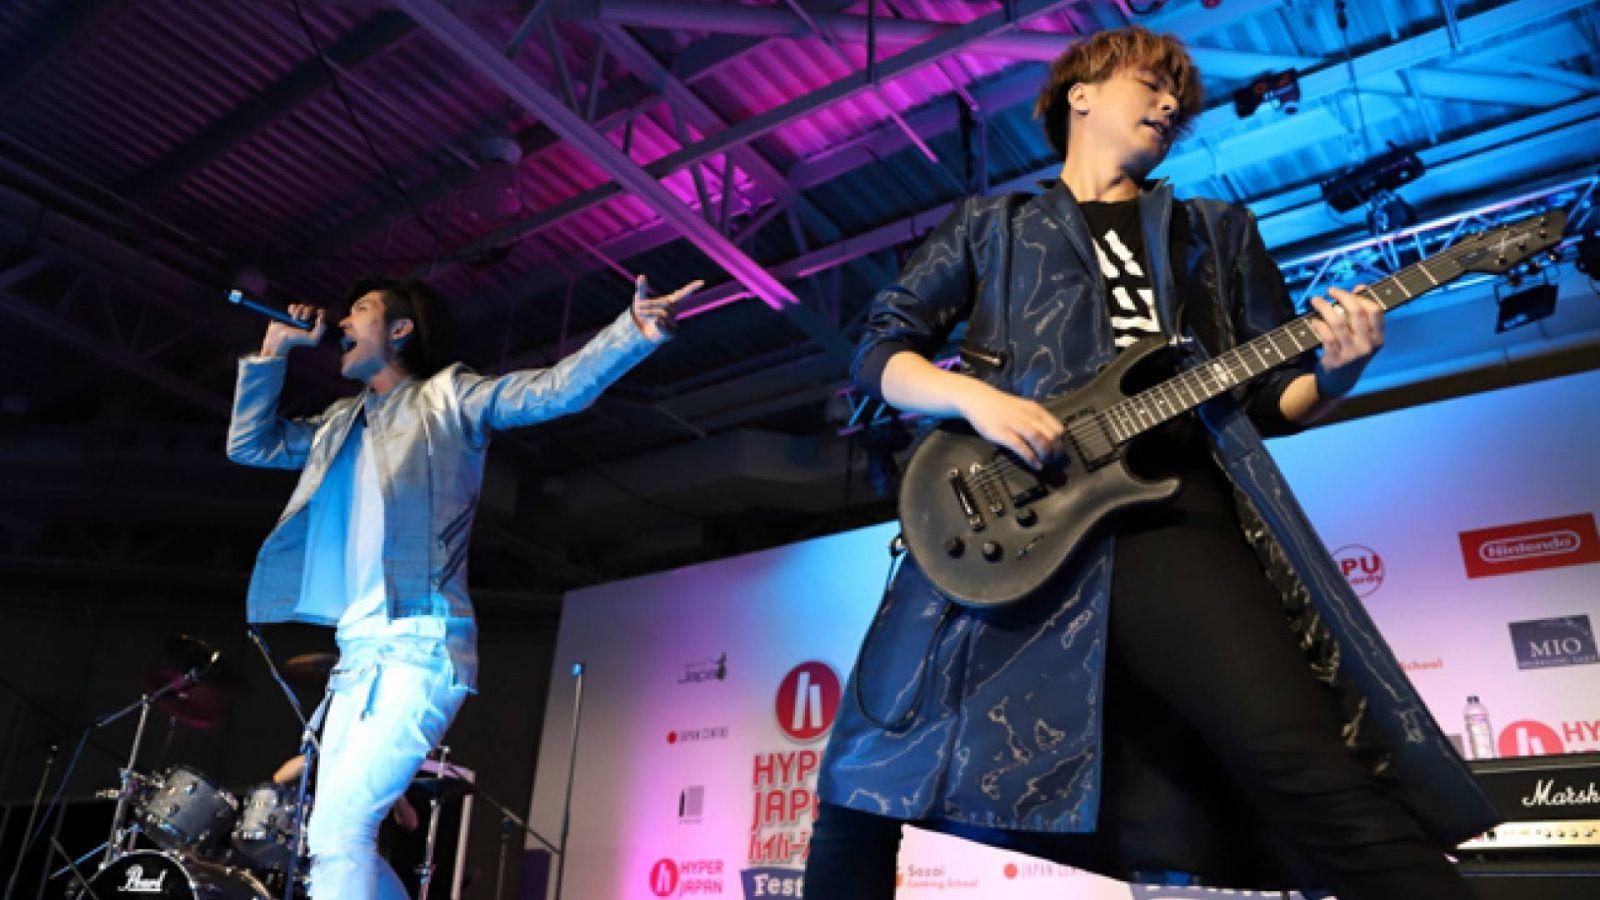 THE SIXTH LIE at HYPER JAPAN Festival 2018, London © ChrisN